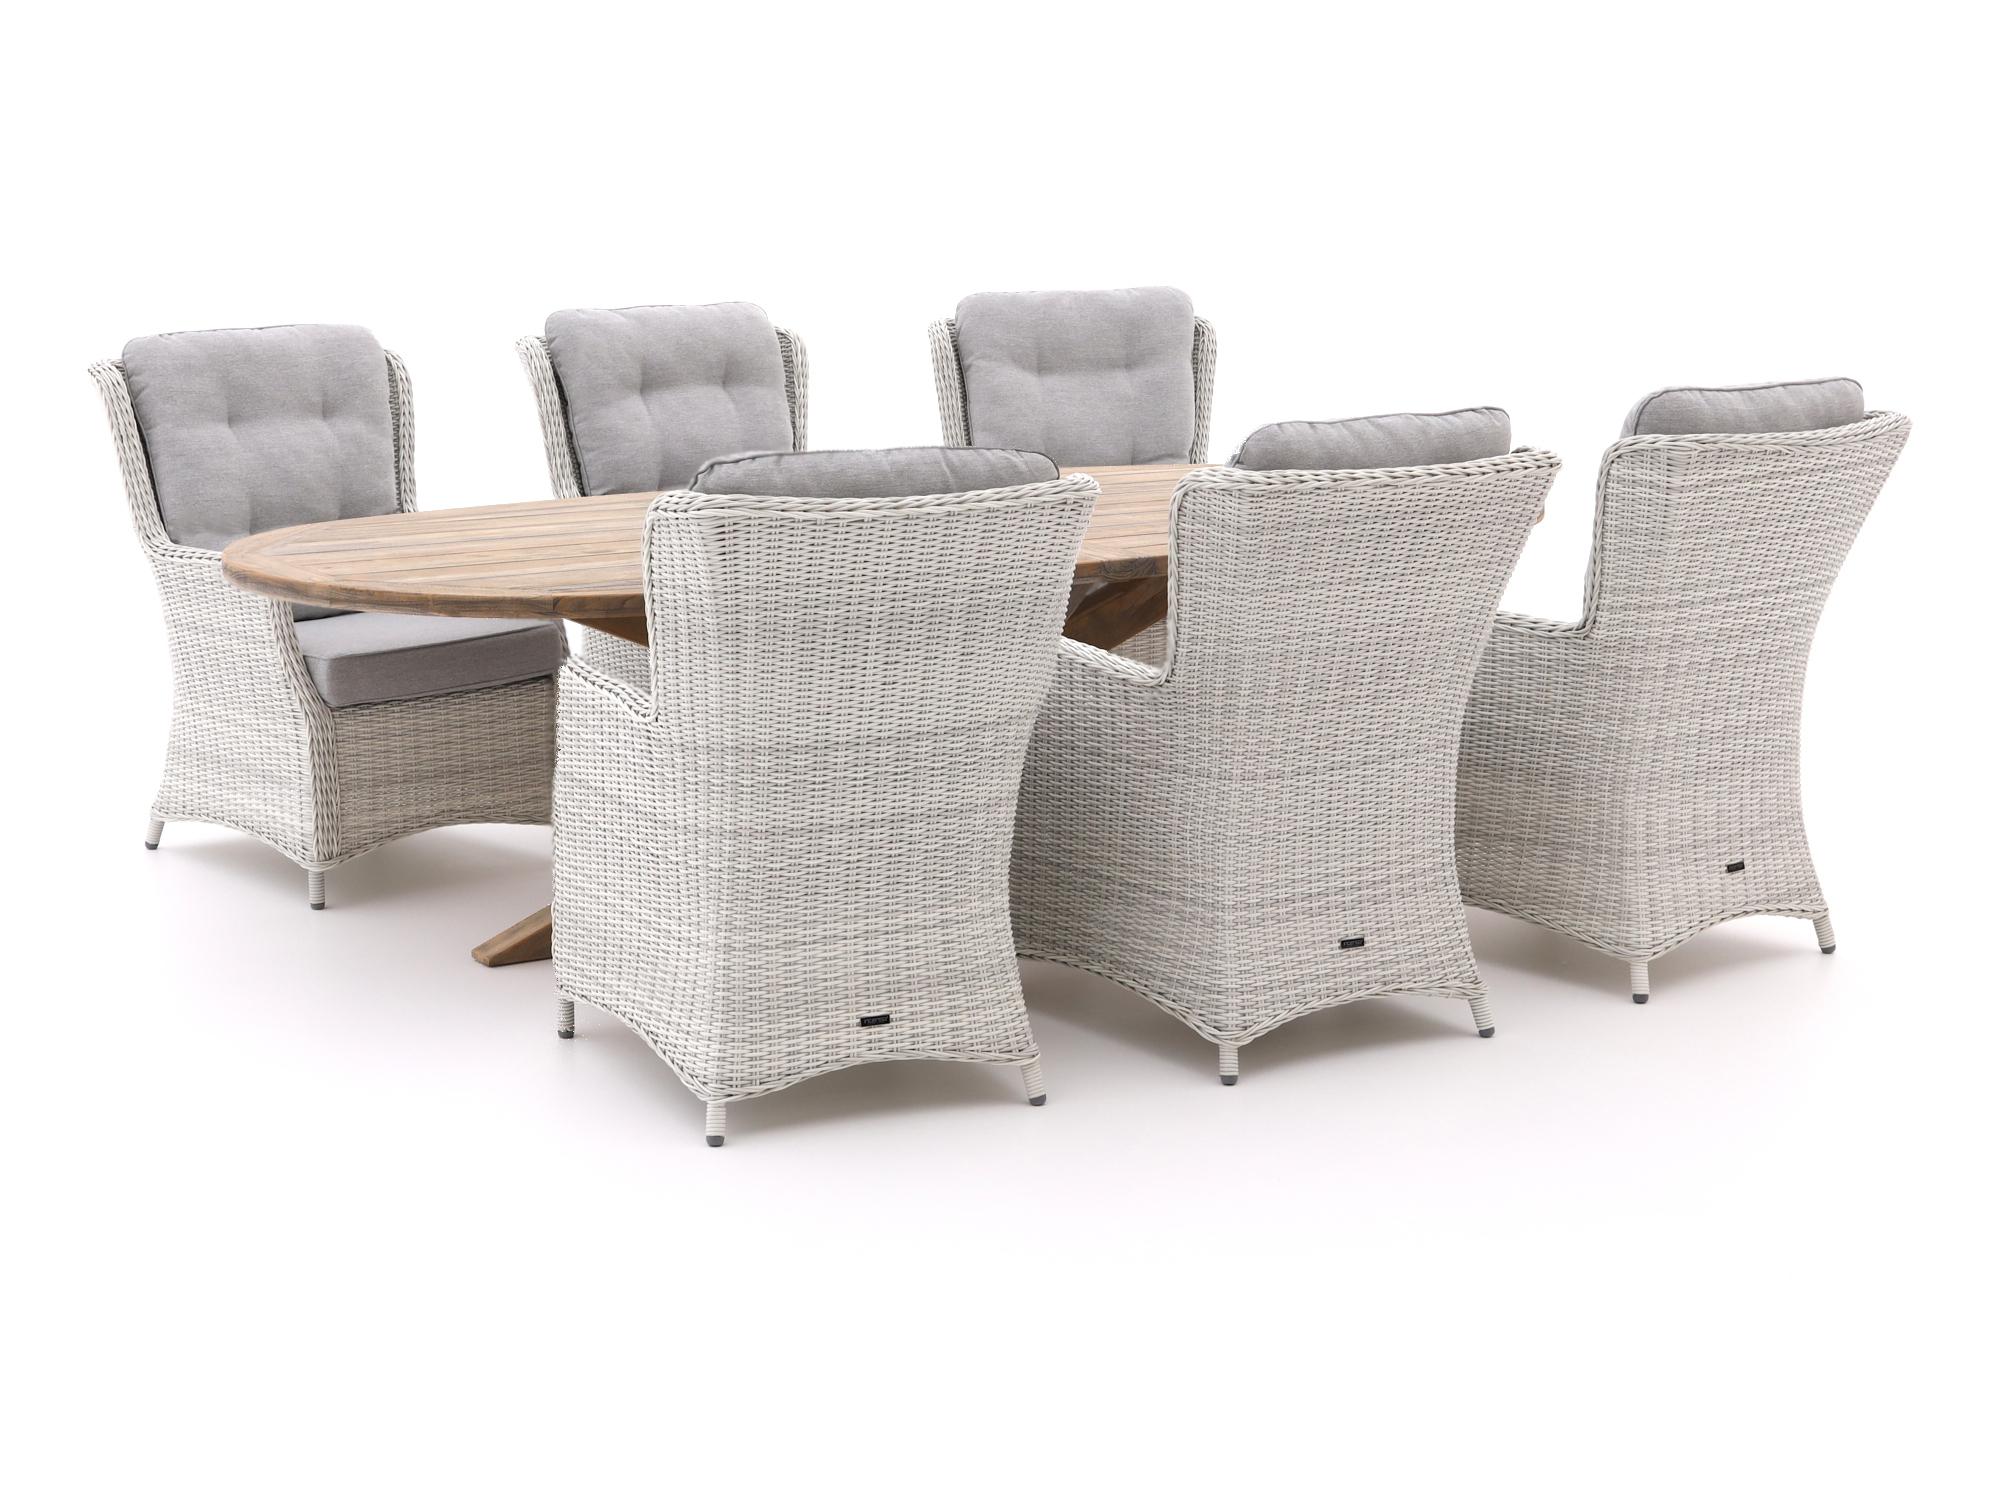 Intenso Milano/ROUGH-Y Ellips 280cm lounge-dining tuinset 7-delig - Laagste prijsgarantie!